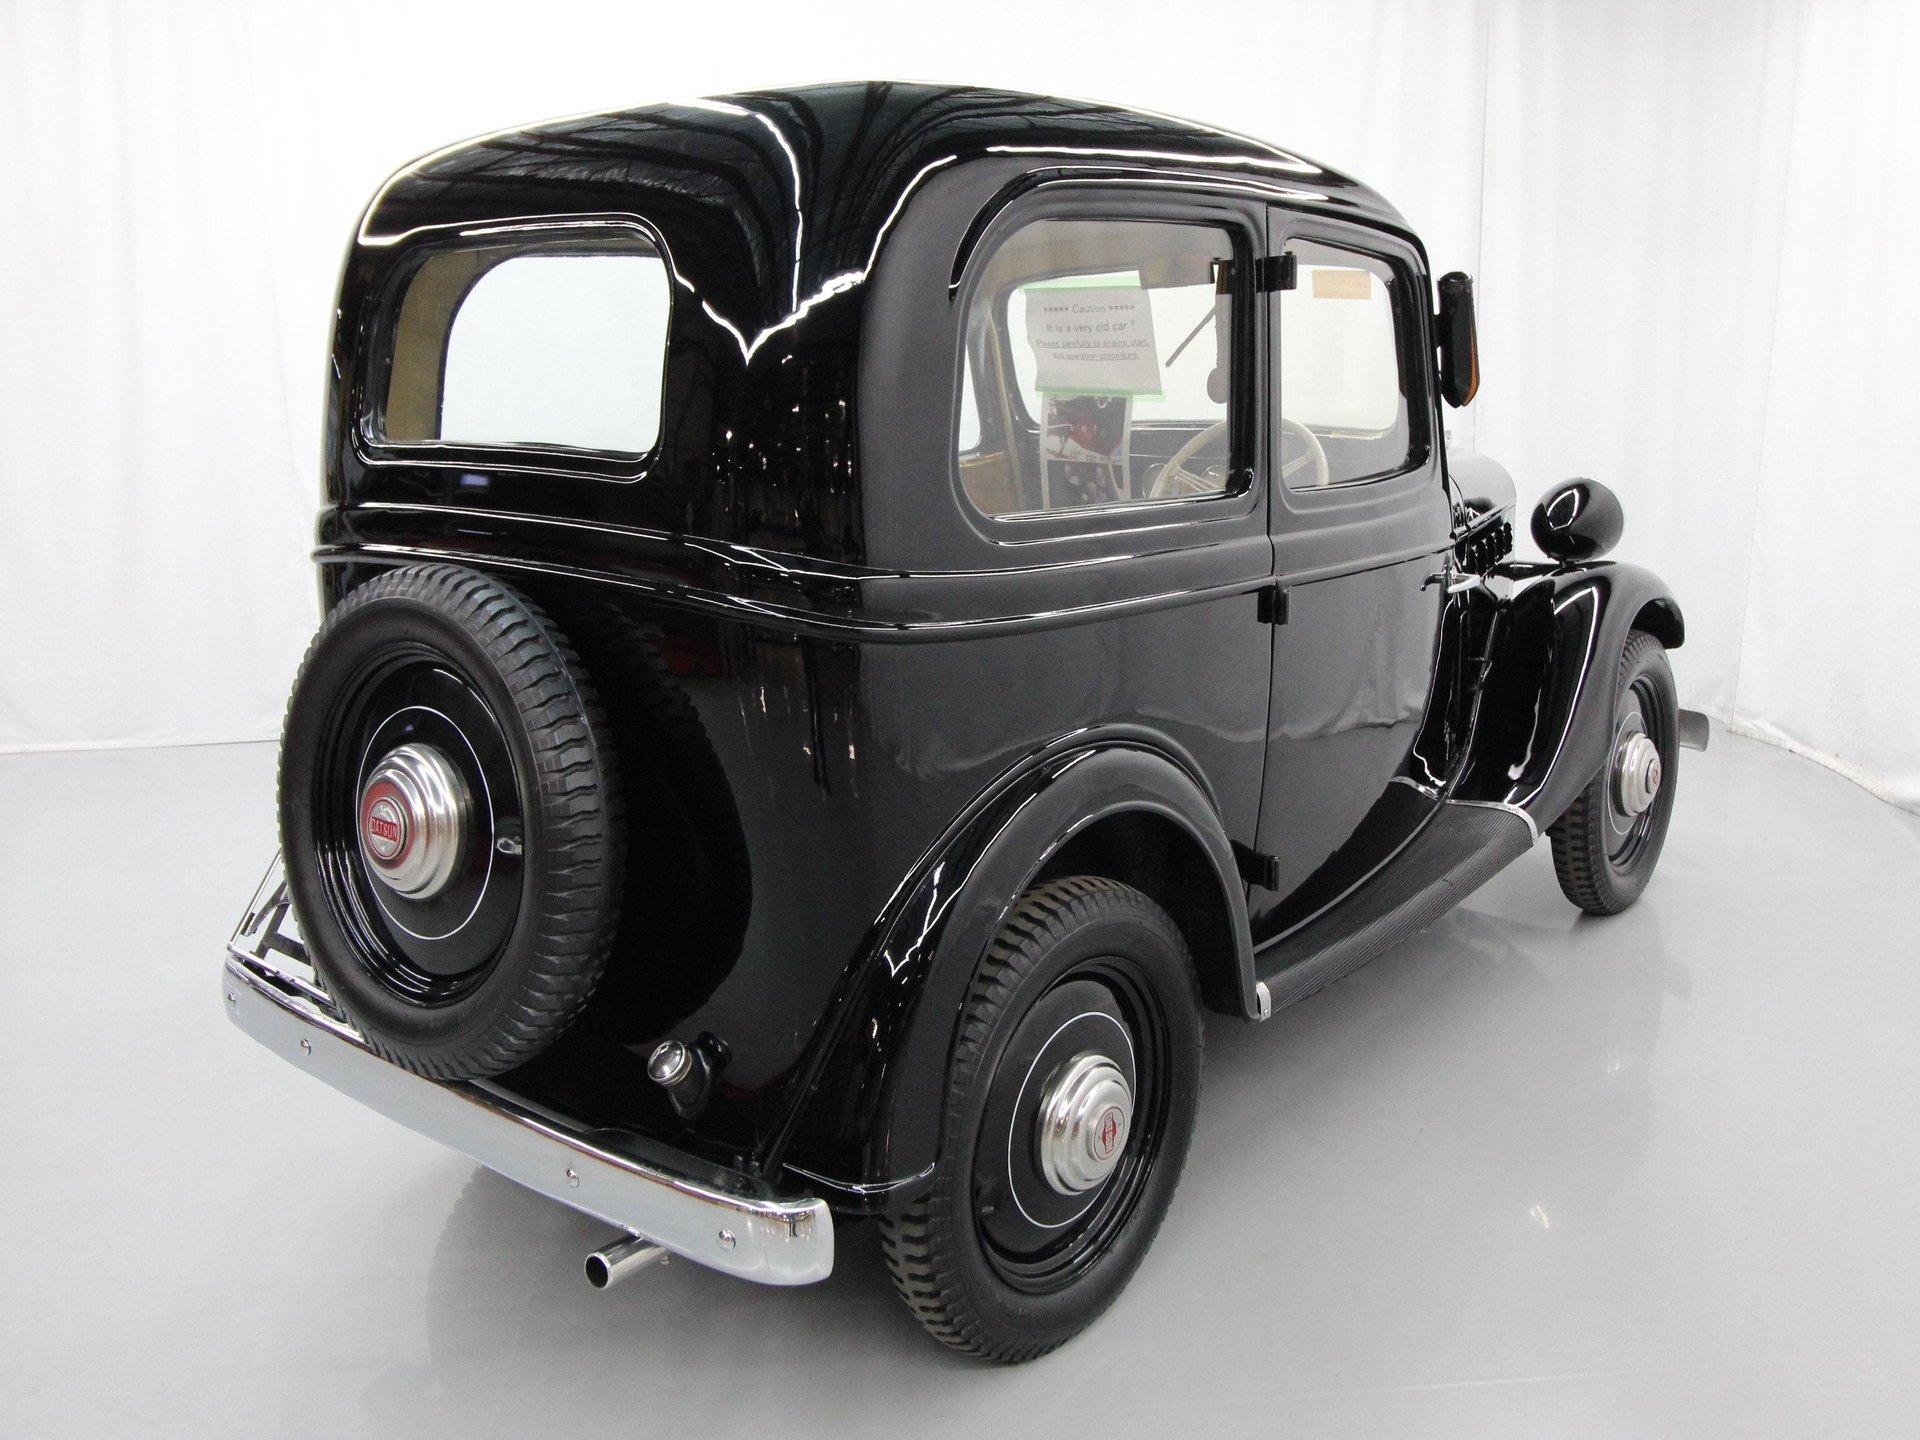 1937 Datsun Type 17